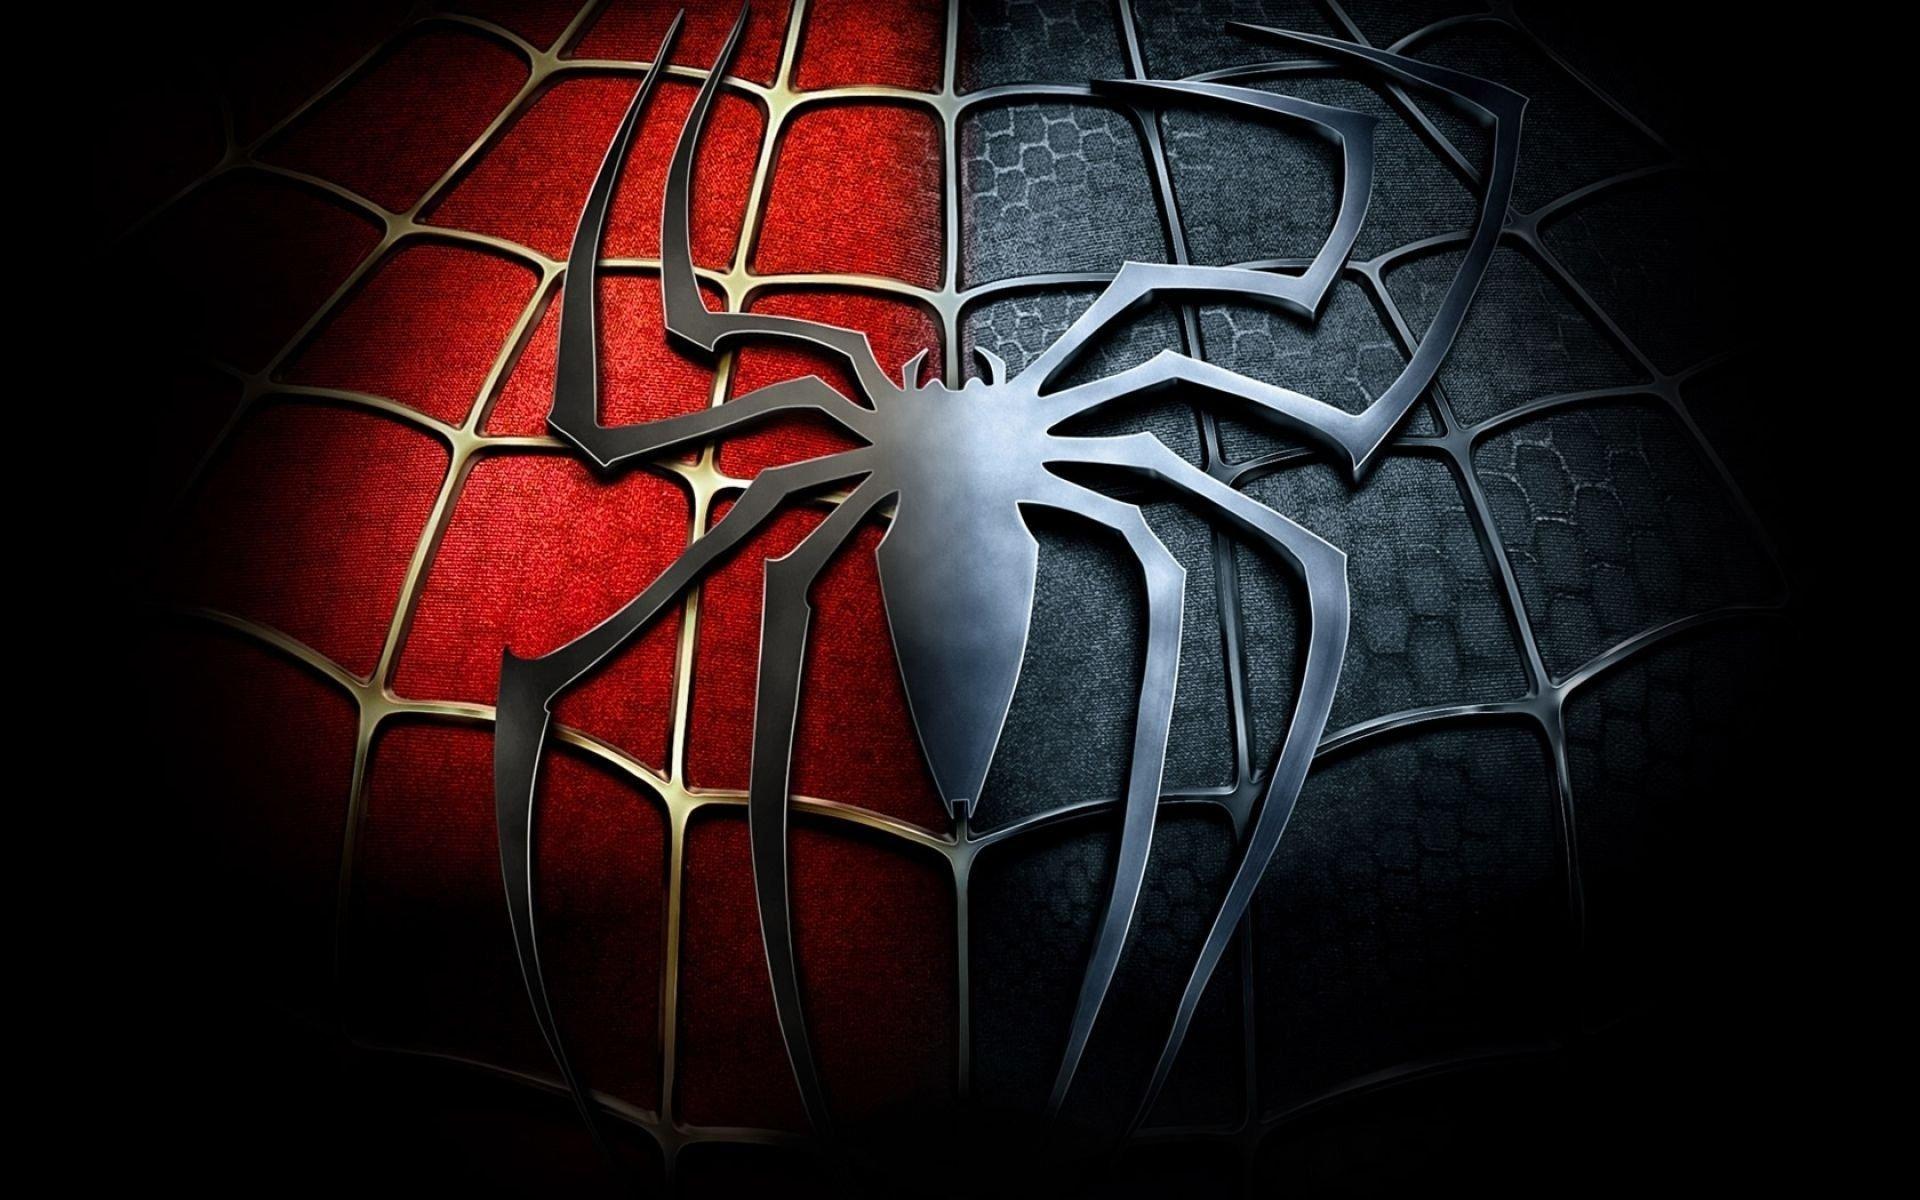 Filme-Spider-Man-Papel-de-Parede-wallpaper-wpc5804783